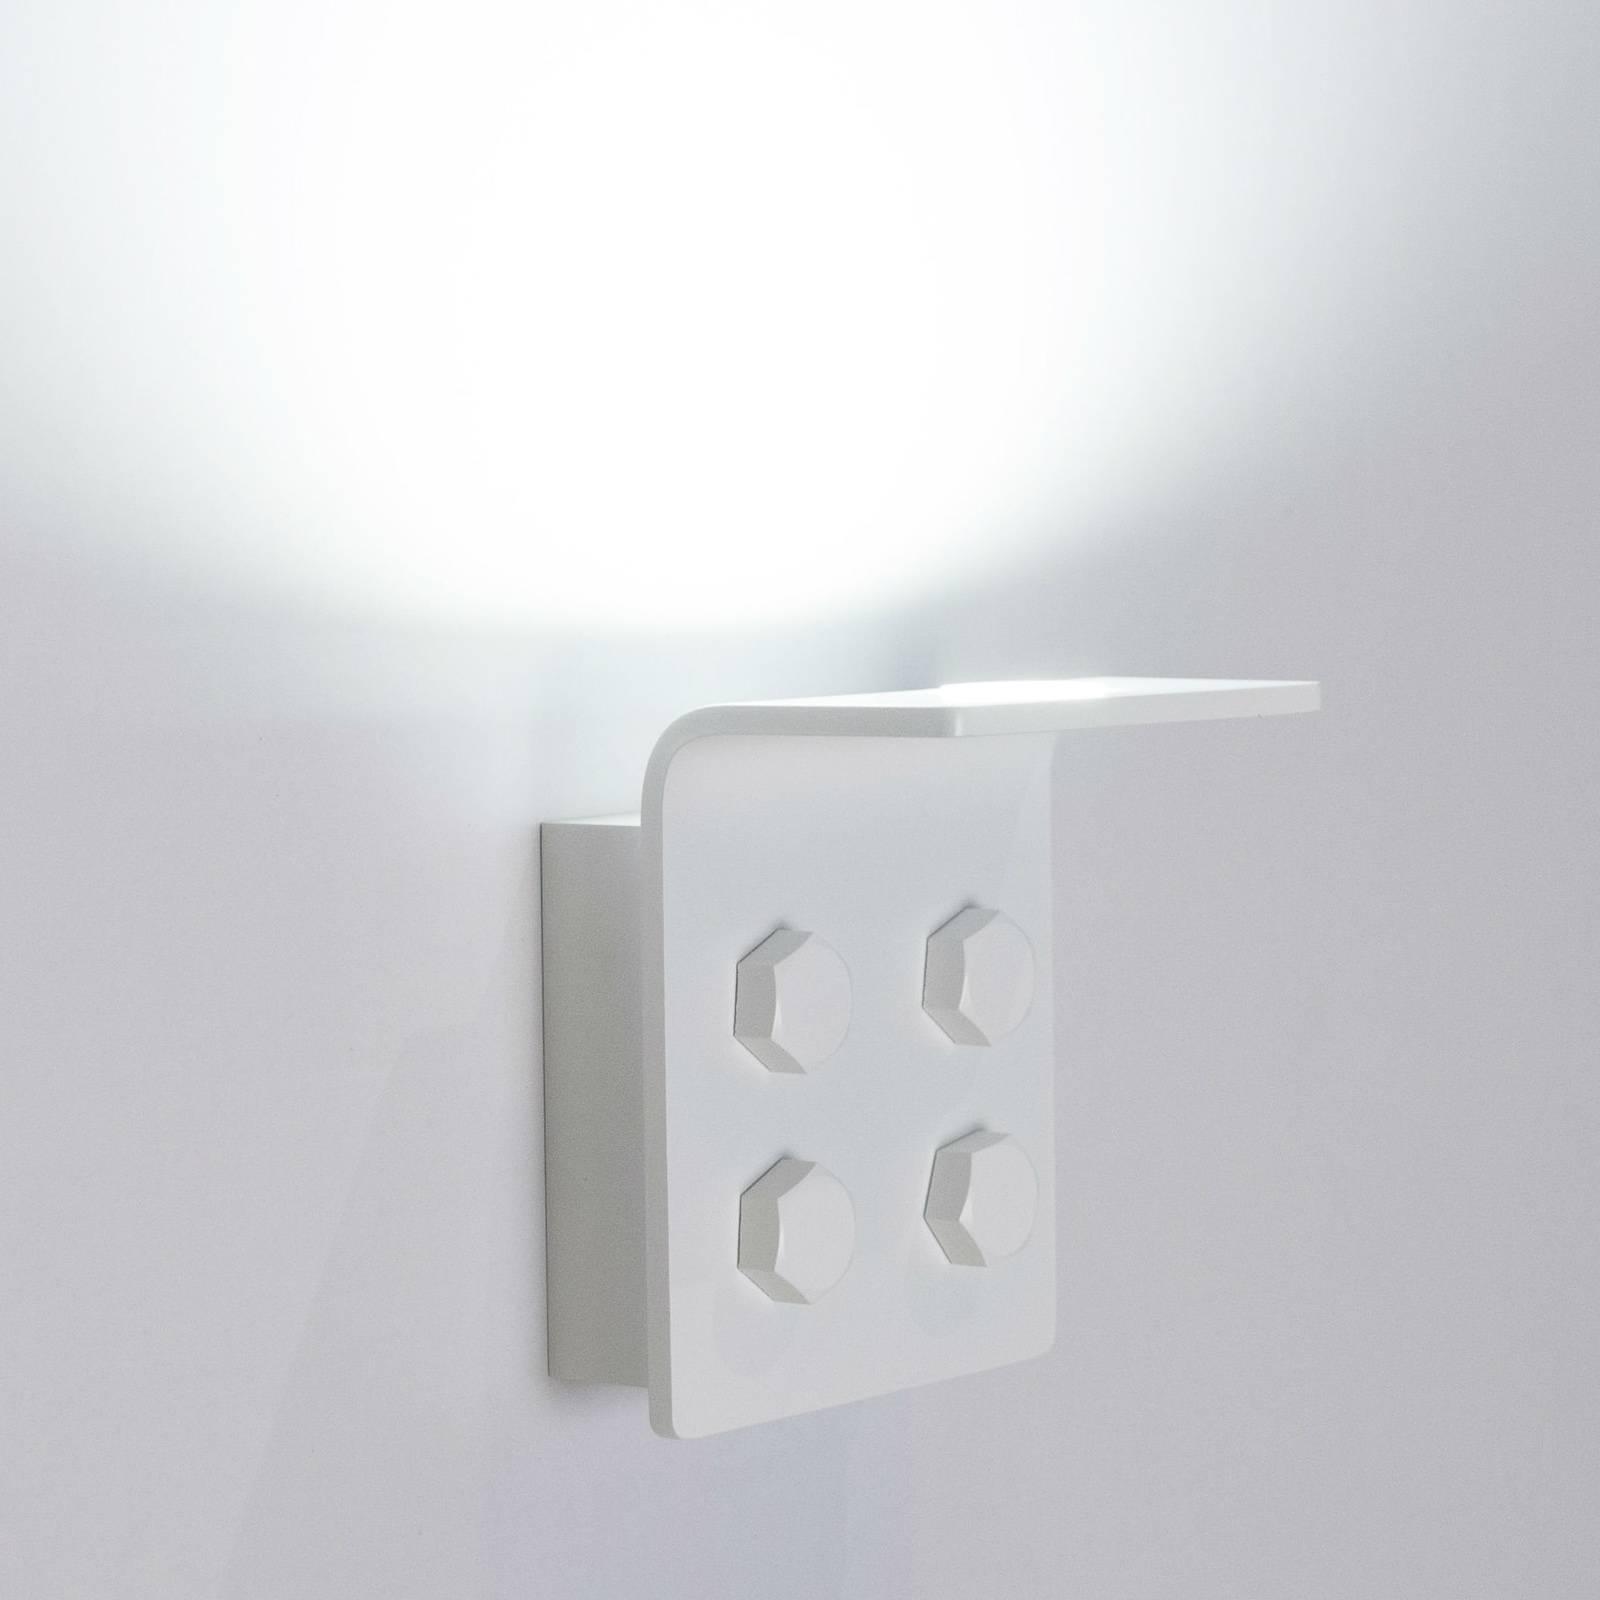 Innermost Bolt LED wandlamp, wit, dimbaar